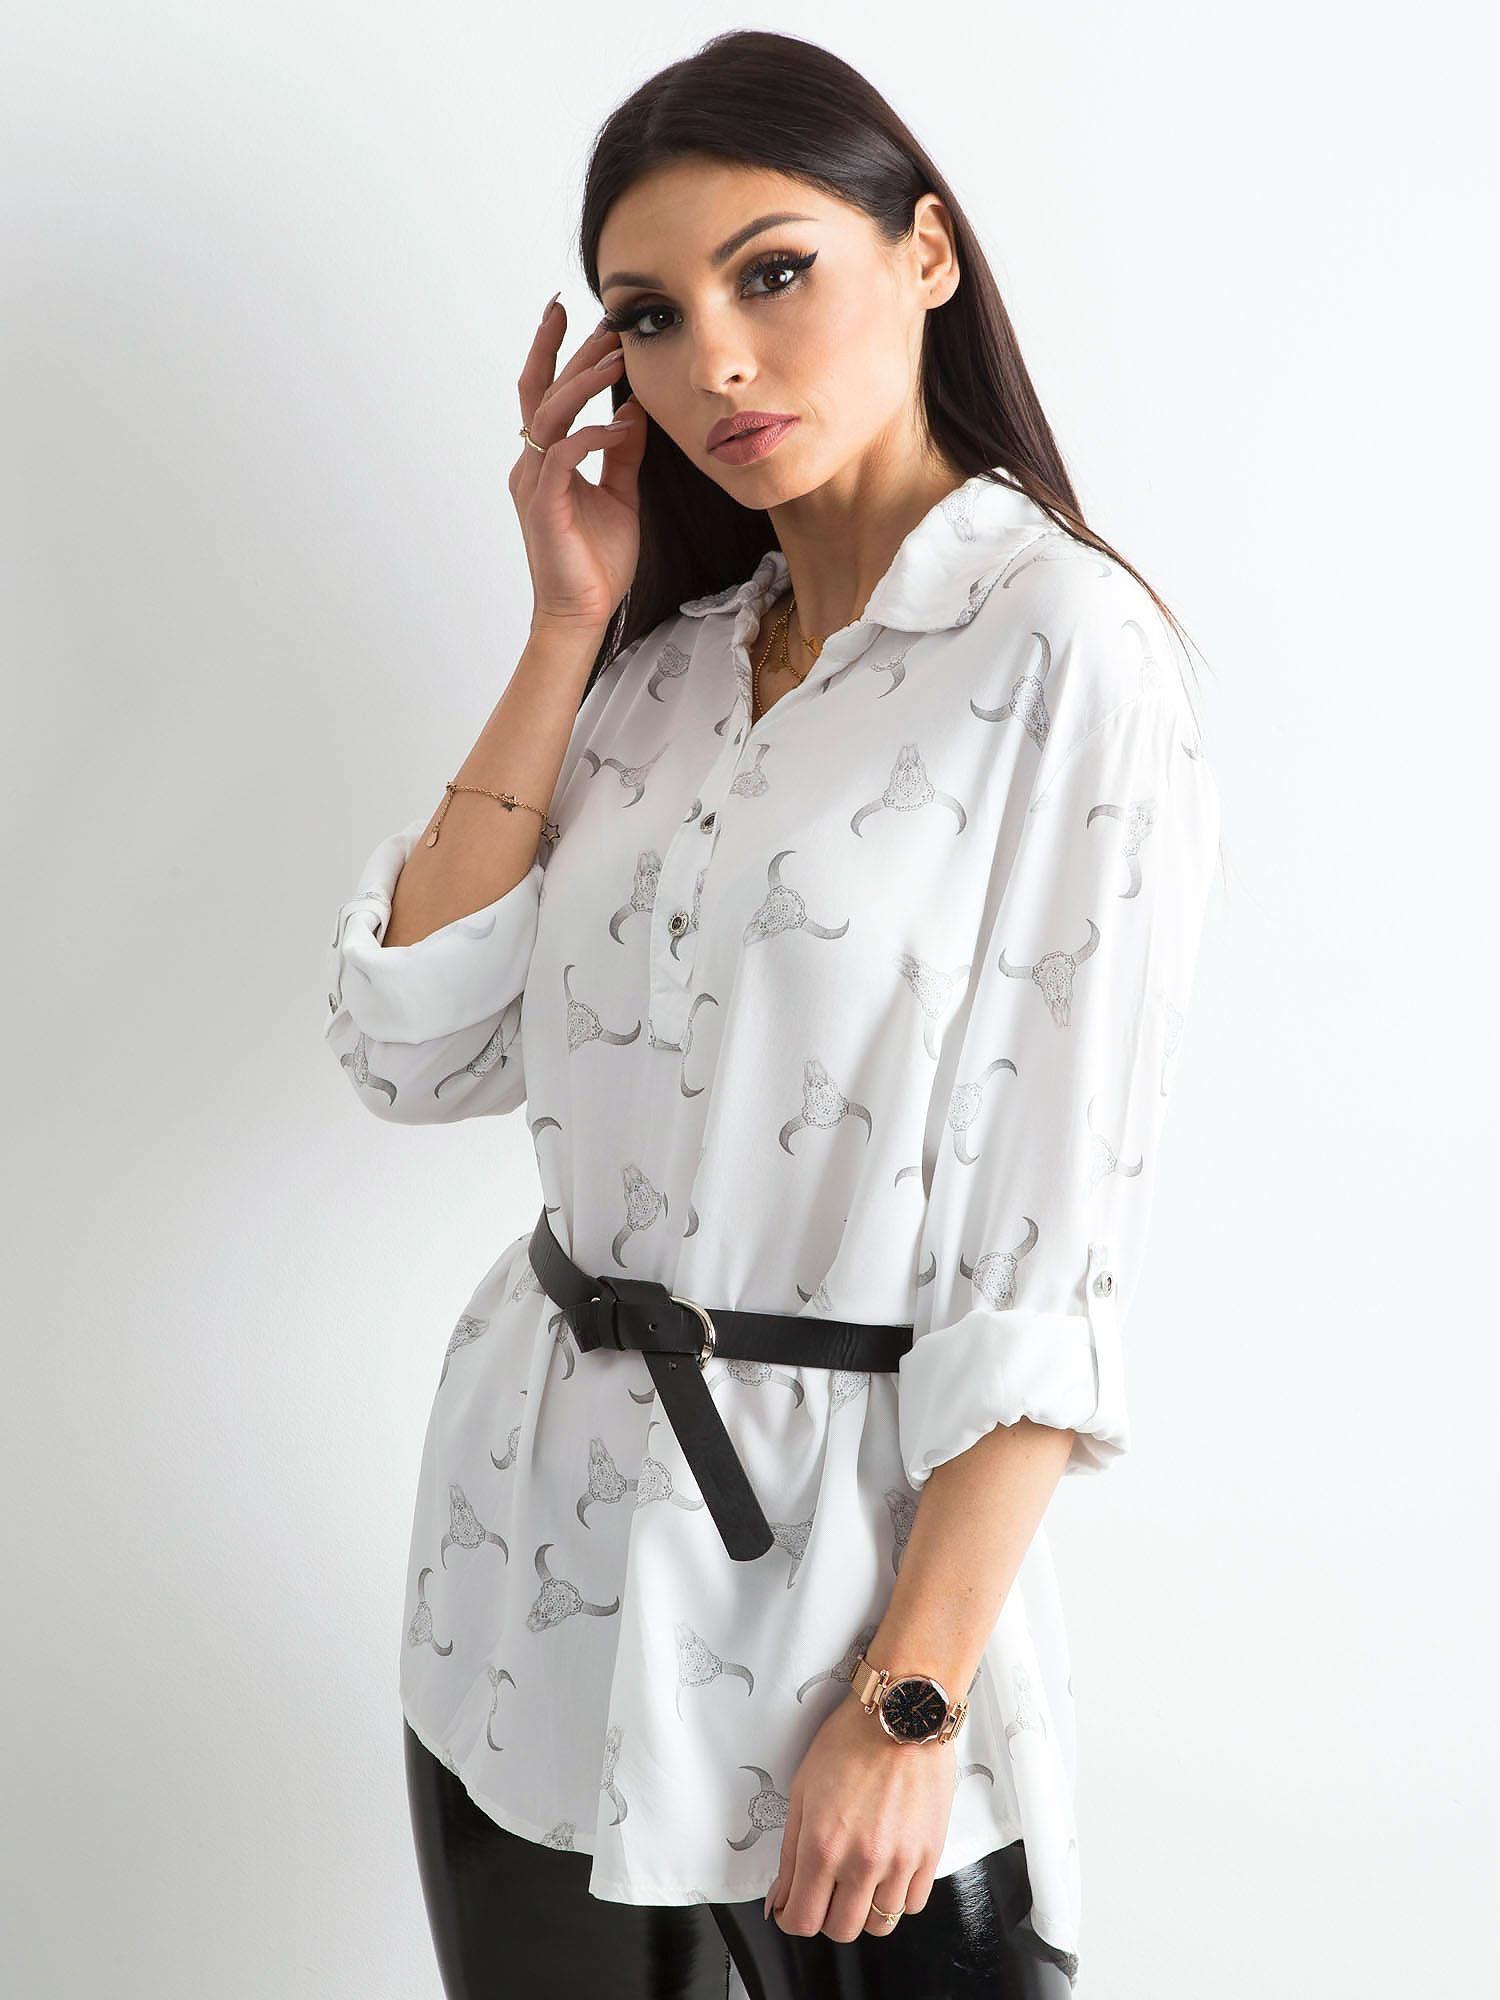 d1c0a75f Biała koszulowa bluzka z nadrukiem